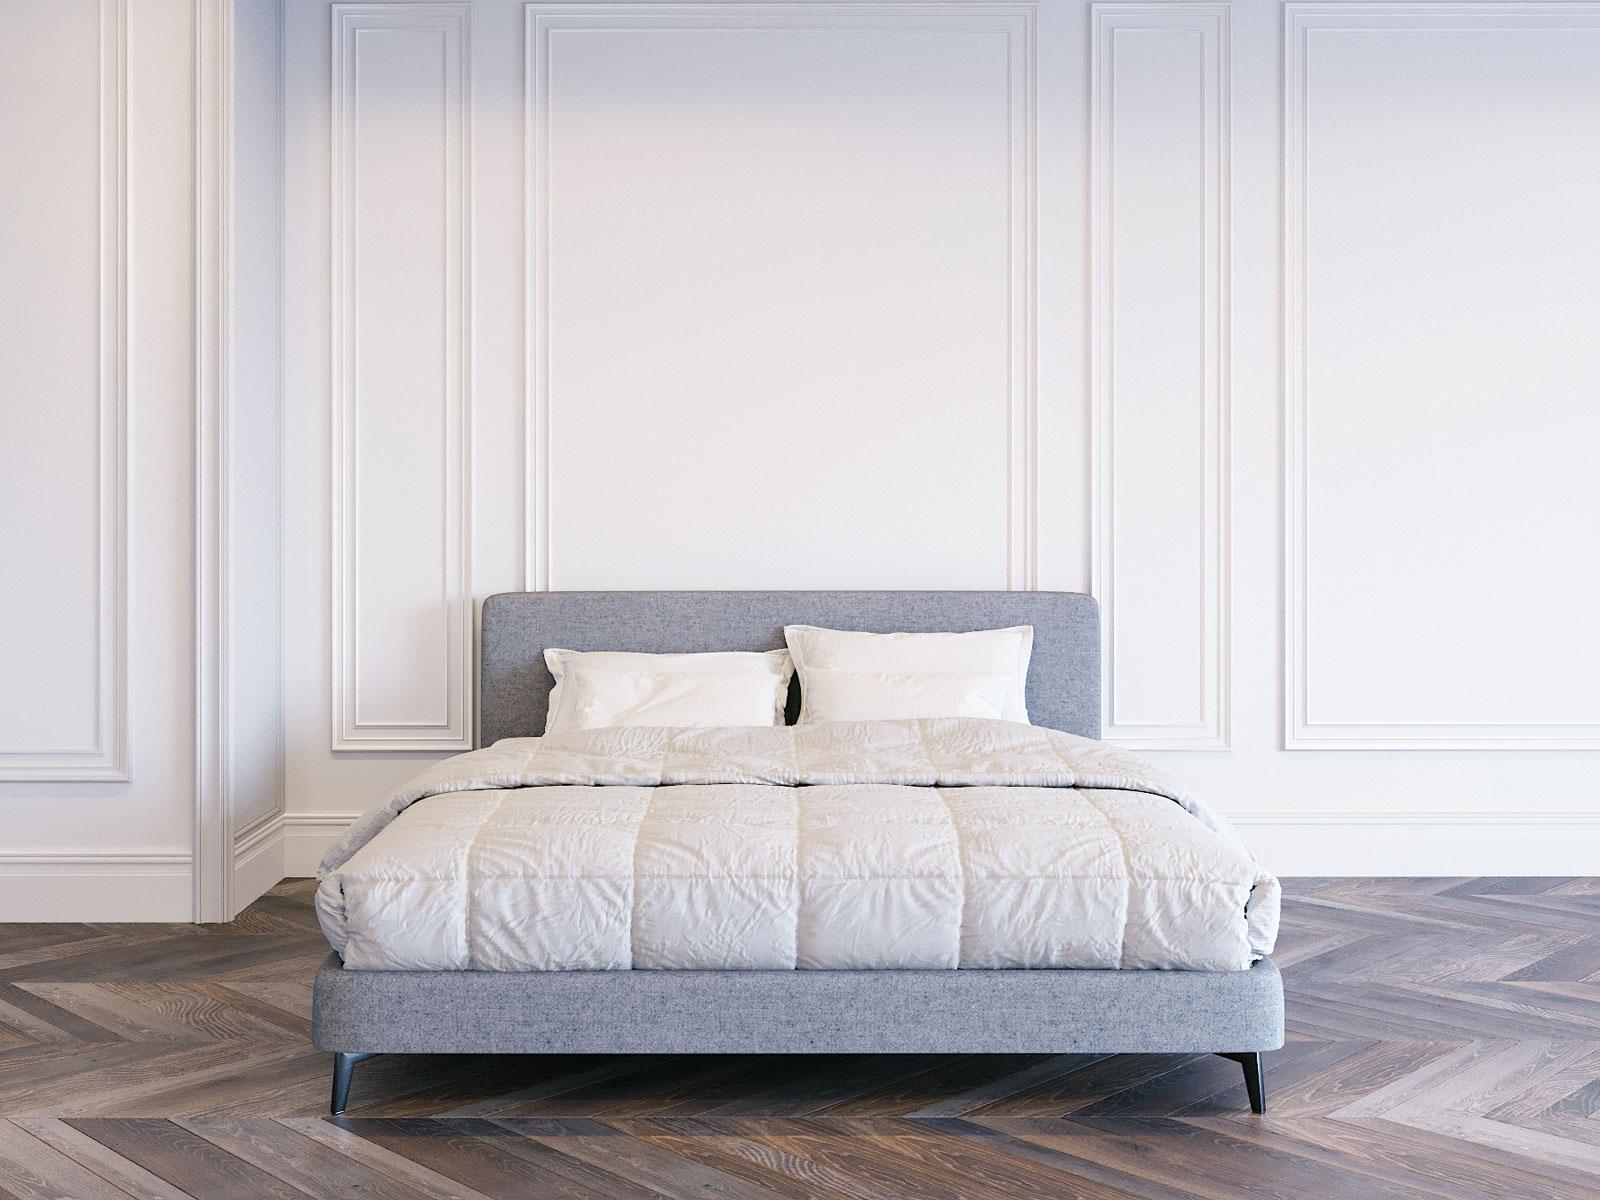 MIA bed